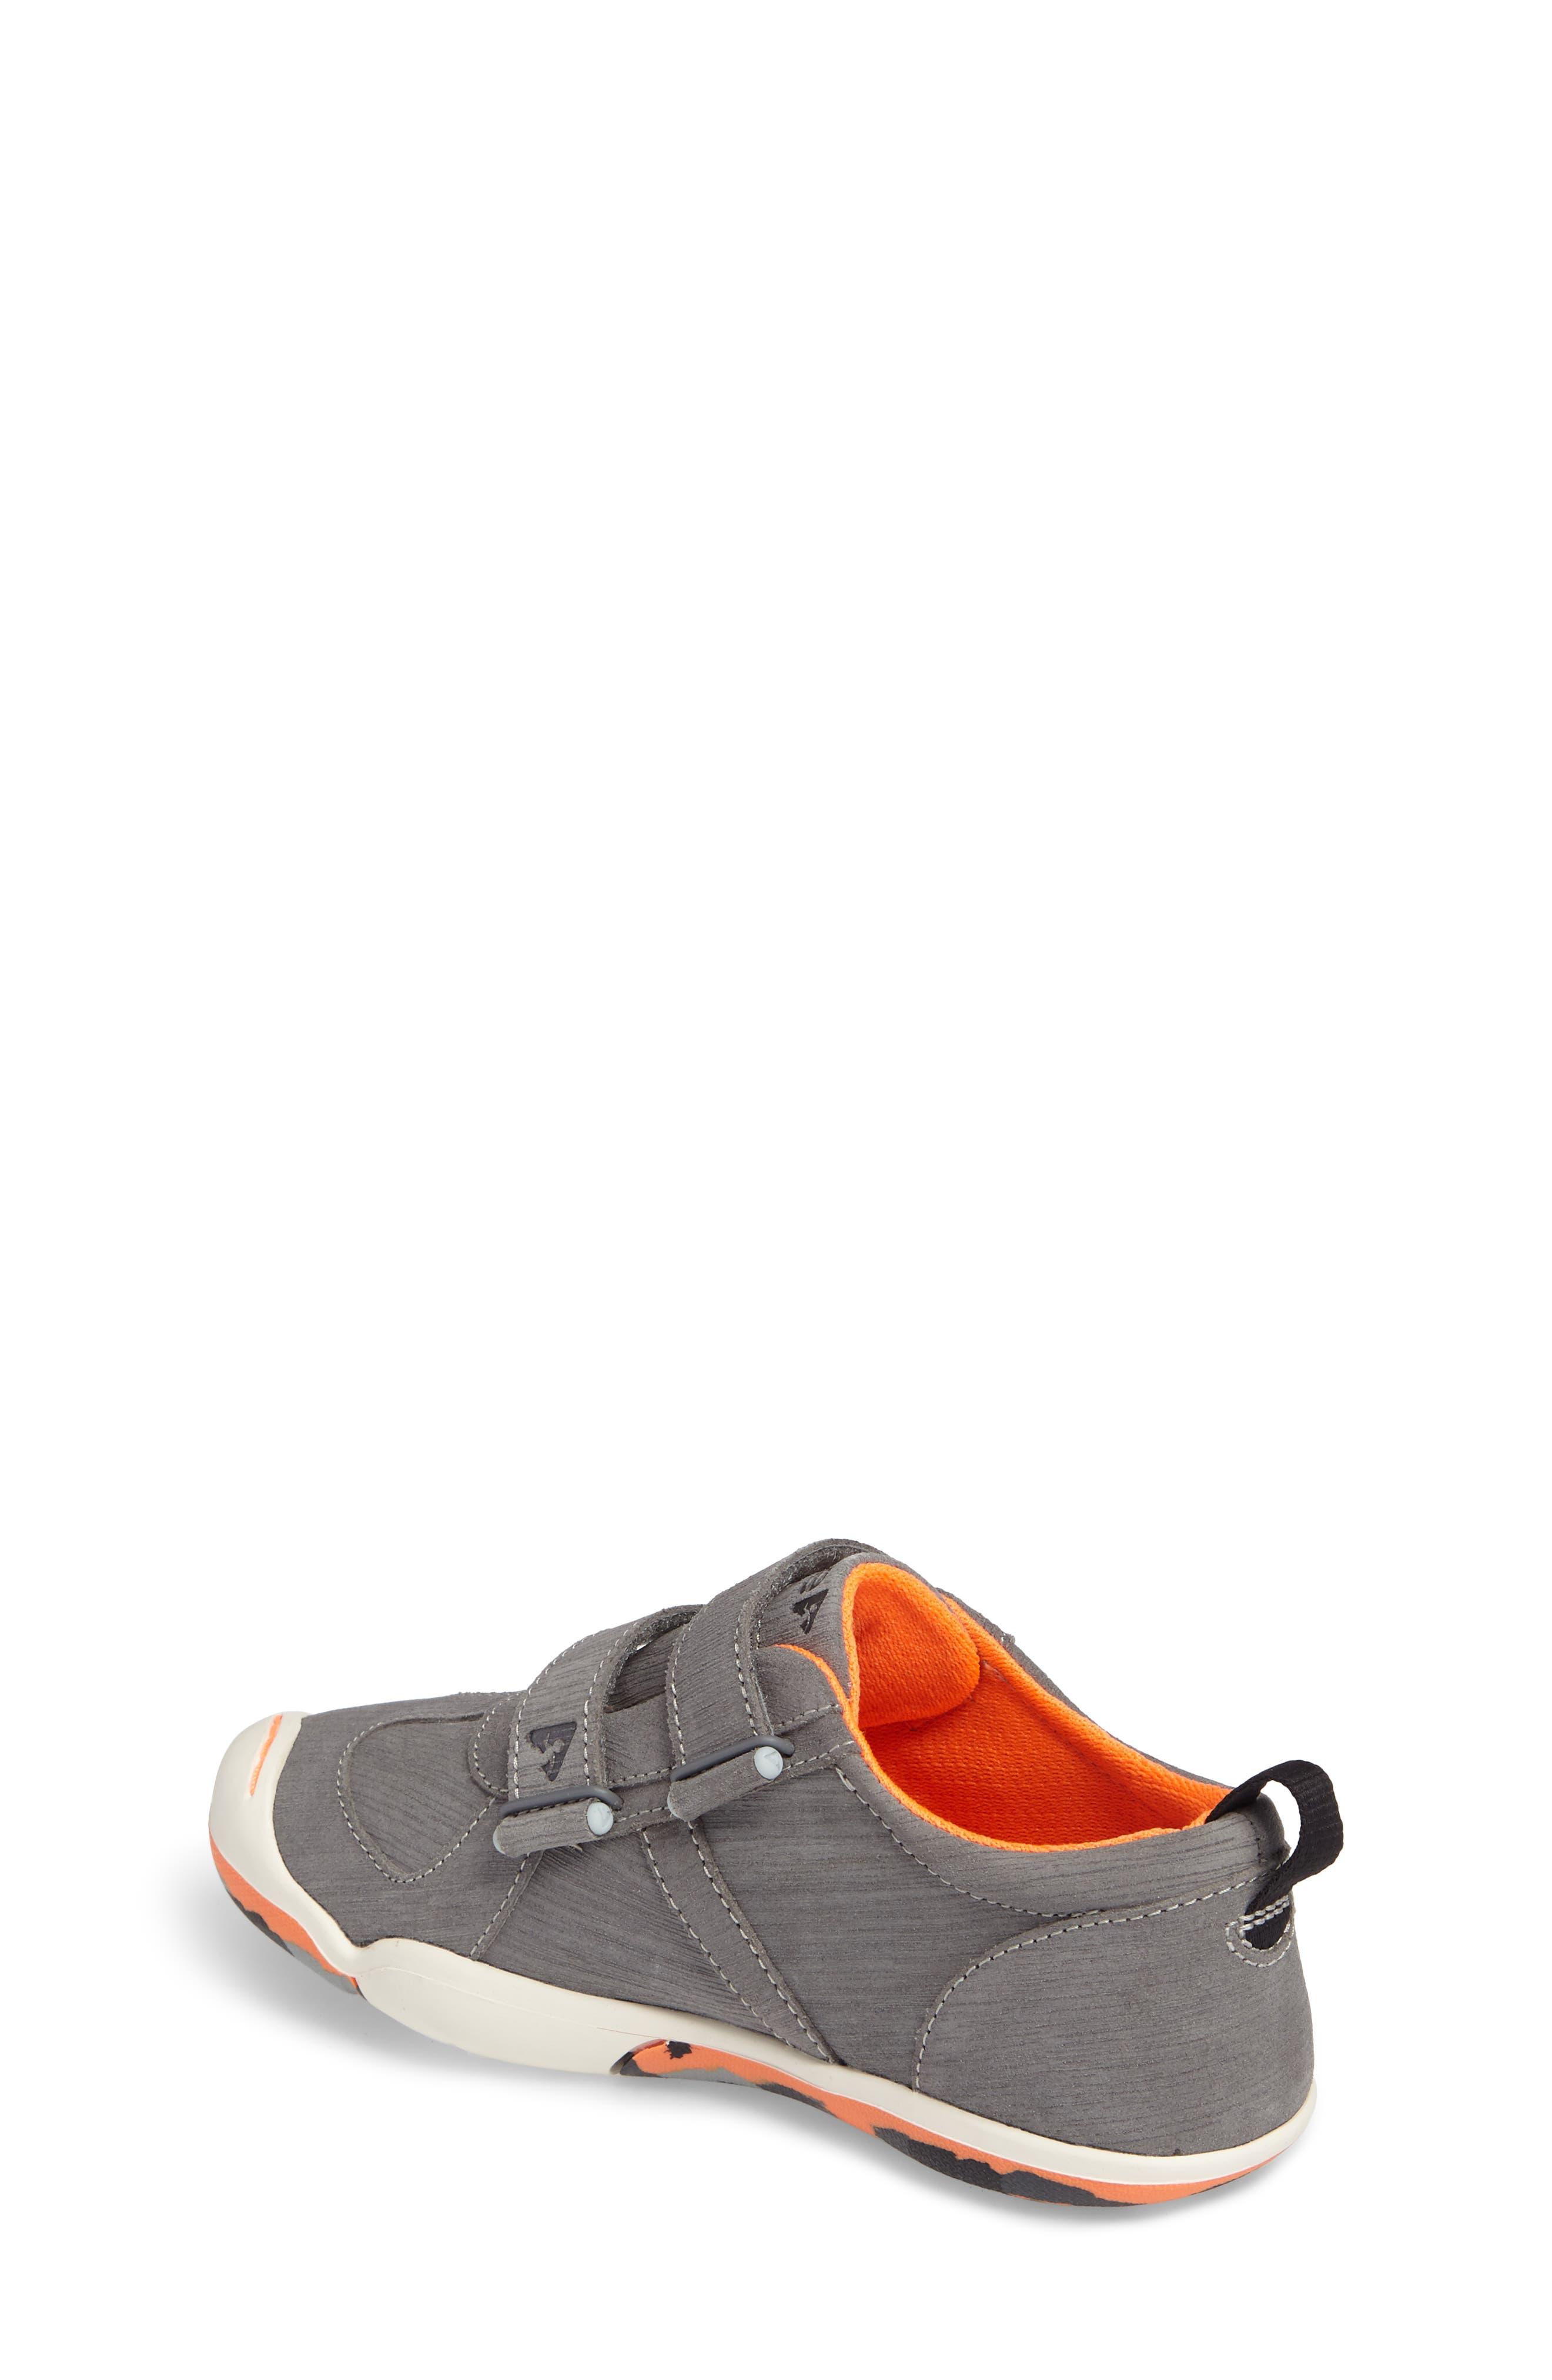 Alternate Image 2  - PLAE'Nat' Customizable Sneaker(Walker, Toddler, Little Kid & Big Kid)